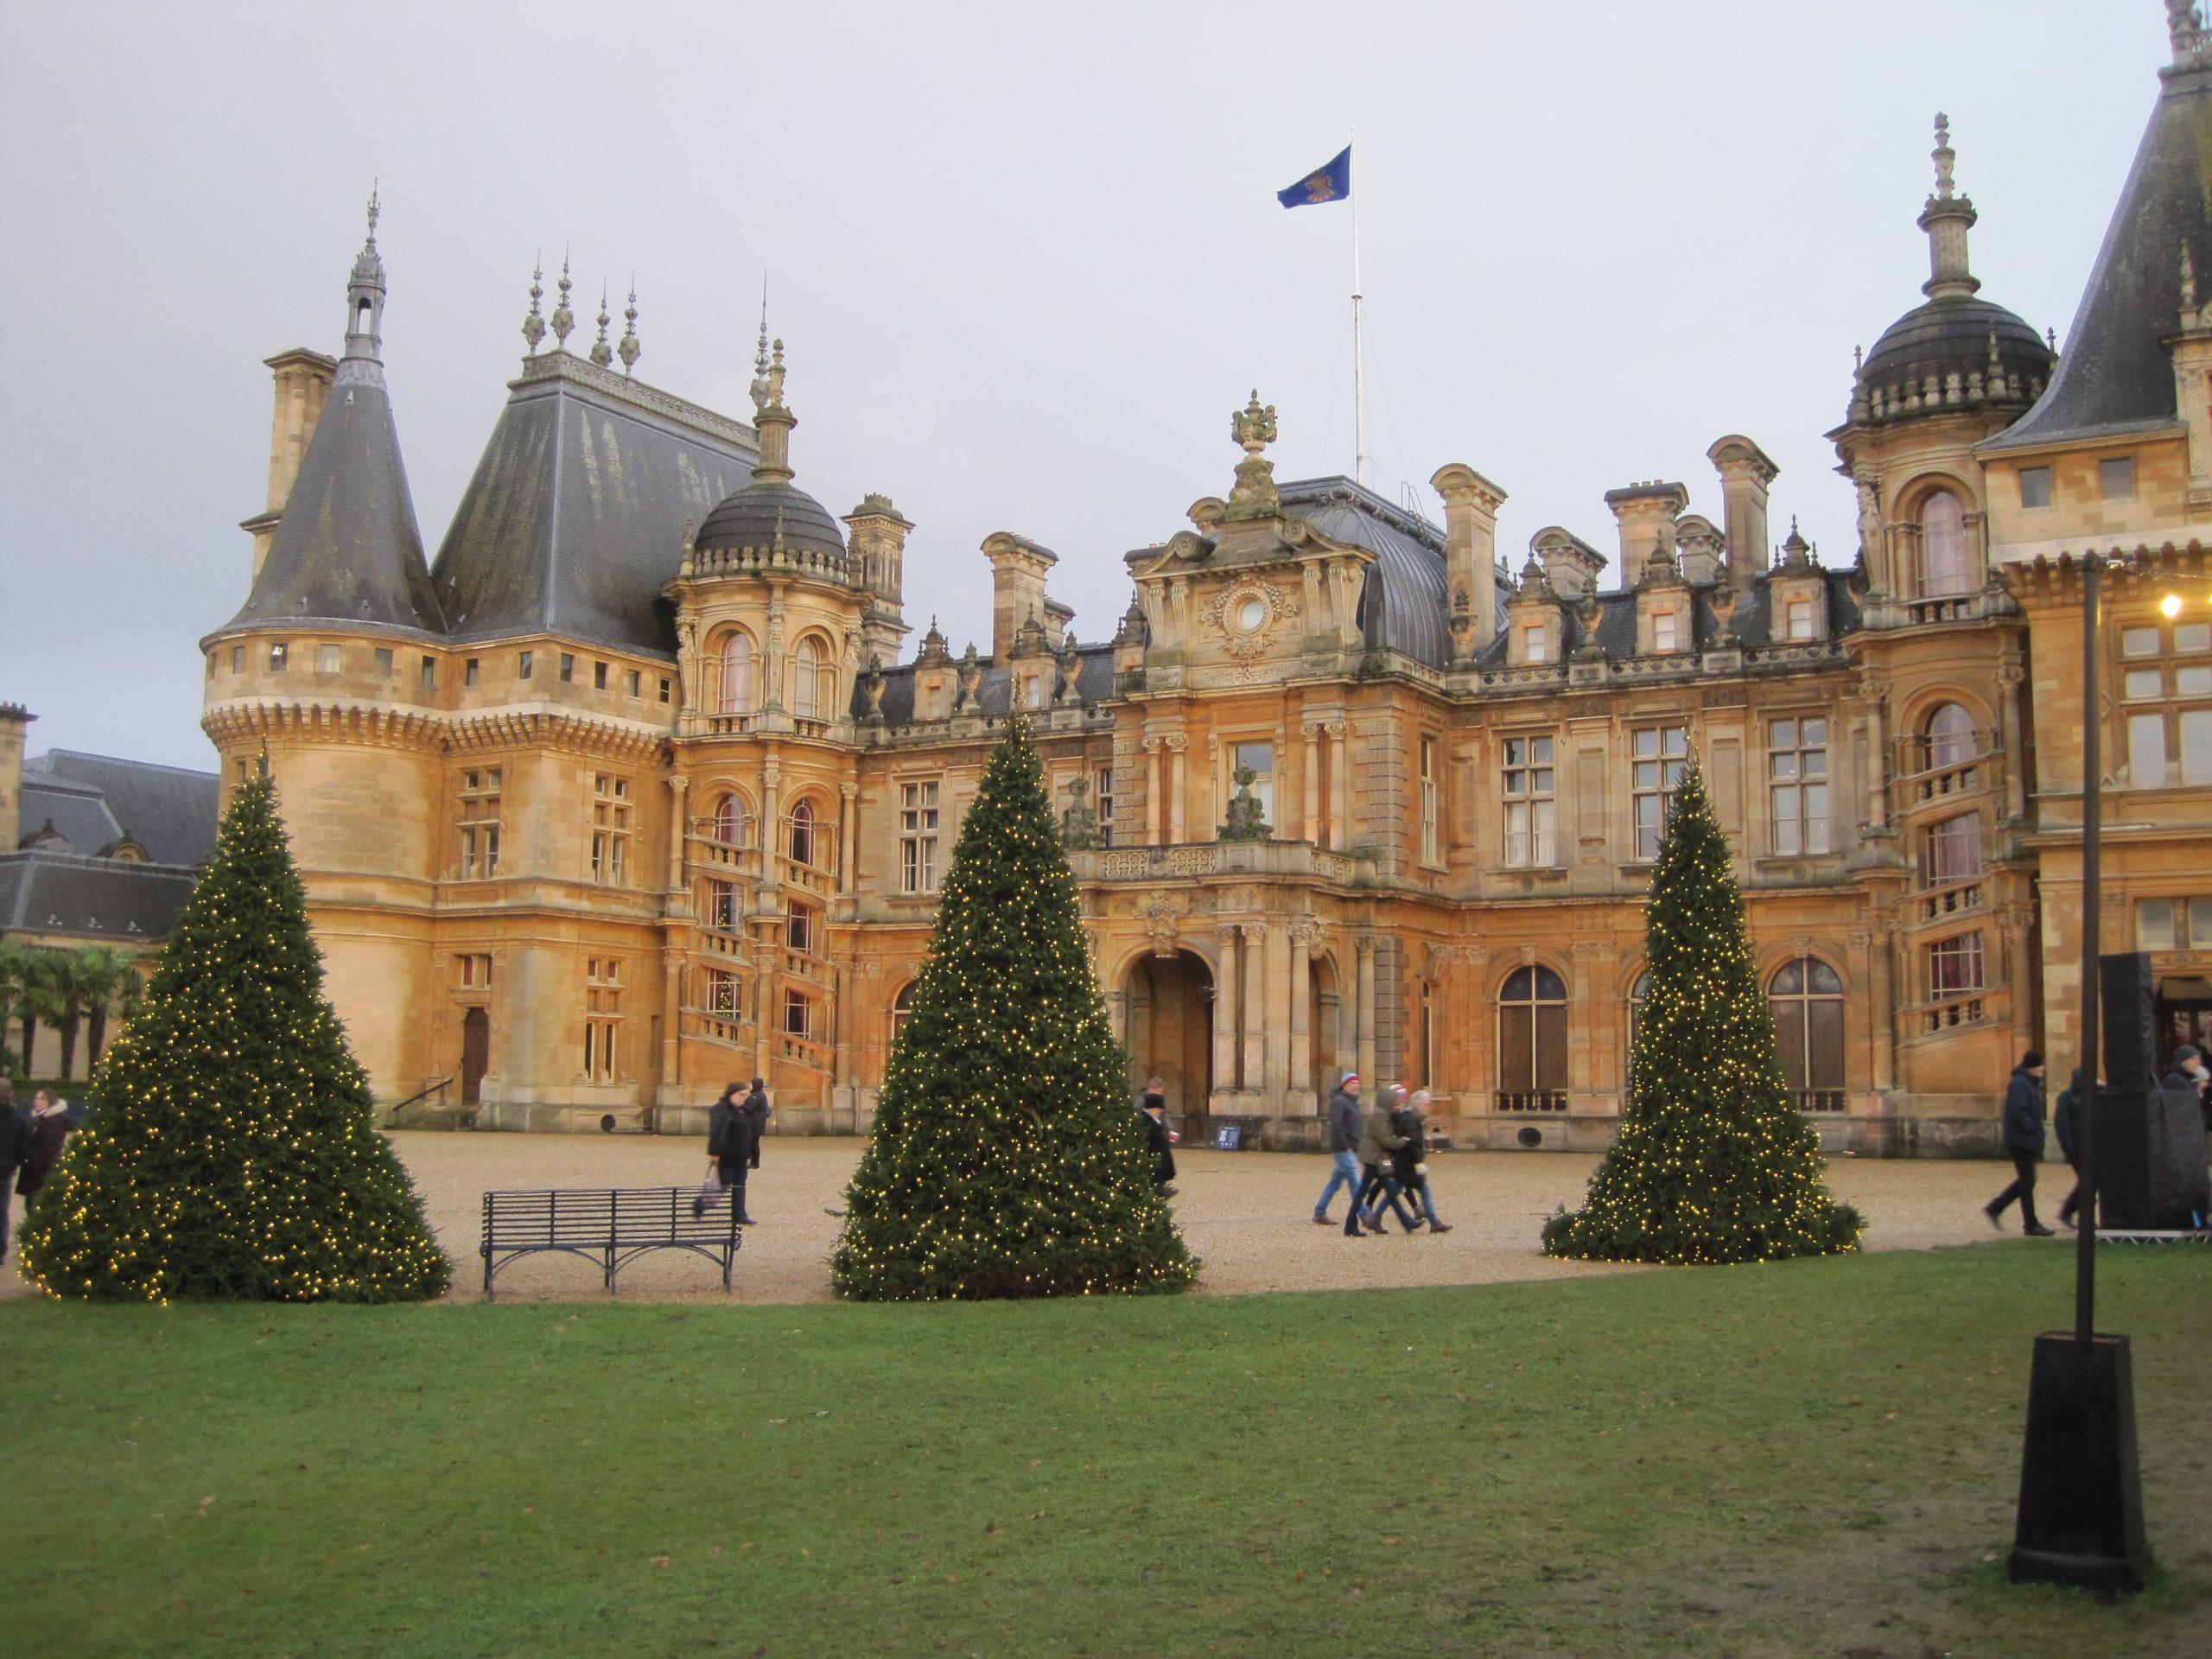 Waddesdon Manor at Christmas - photo by Juliamaud